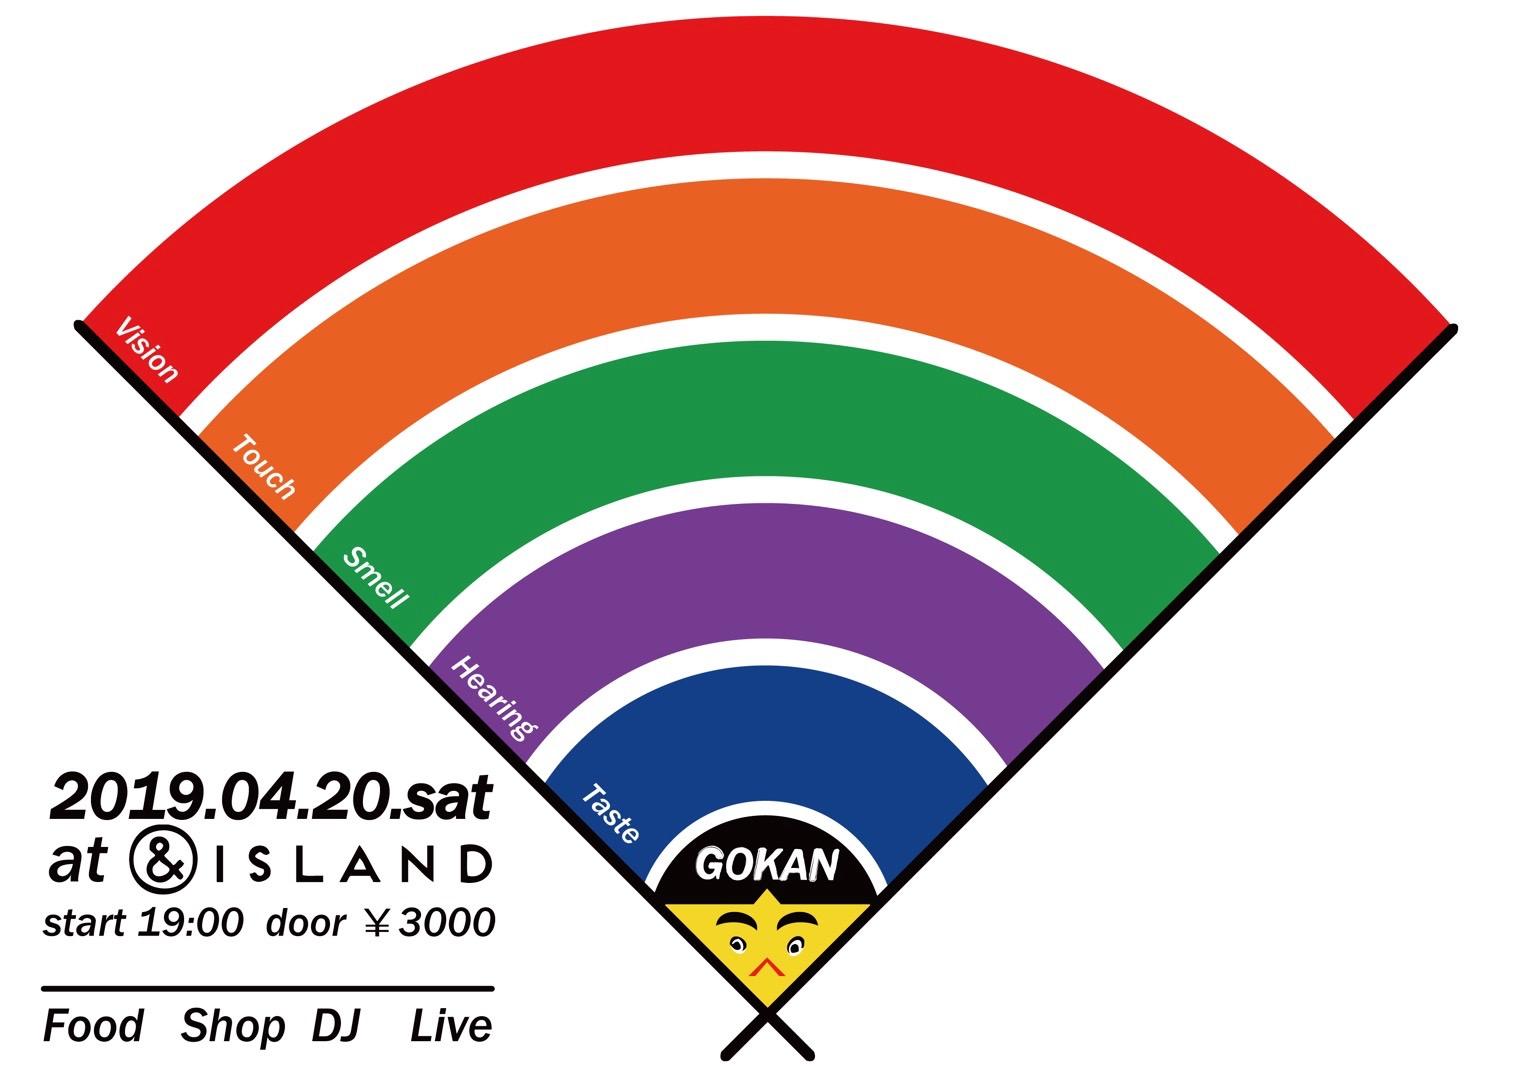 GOKAN Food Shop DJ Live 04.20 出展